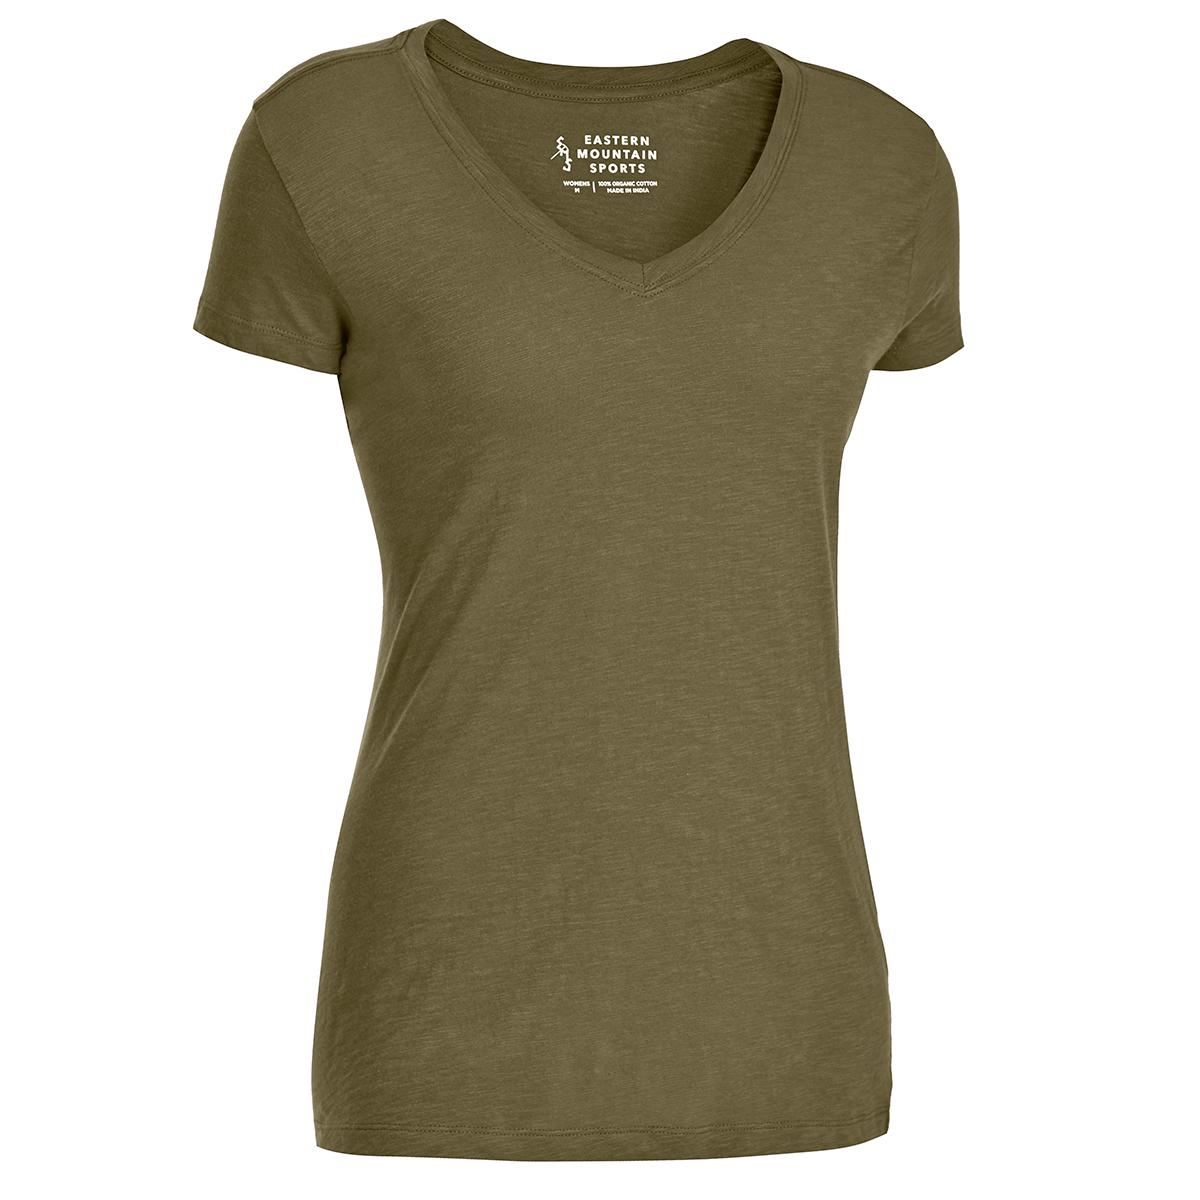 Ems Women's Organic Slub V-Neck Short-Sleeve Tee - Green, XS